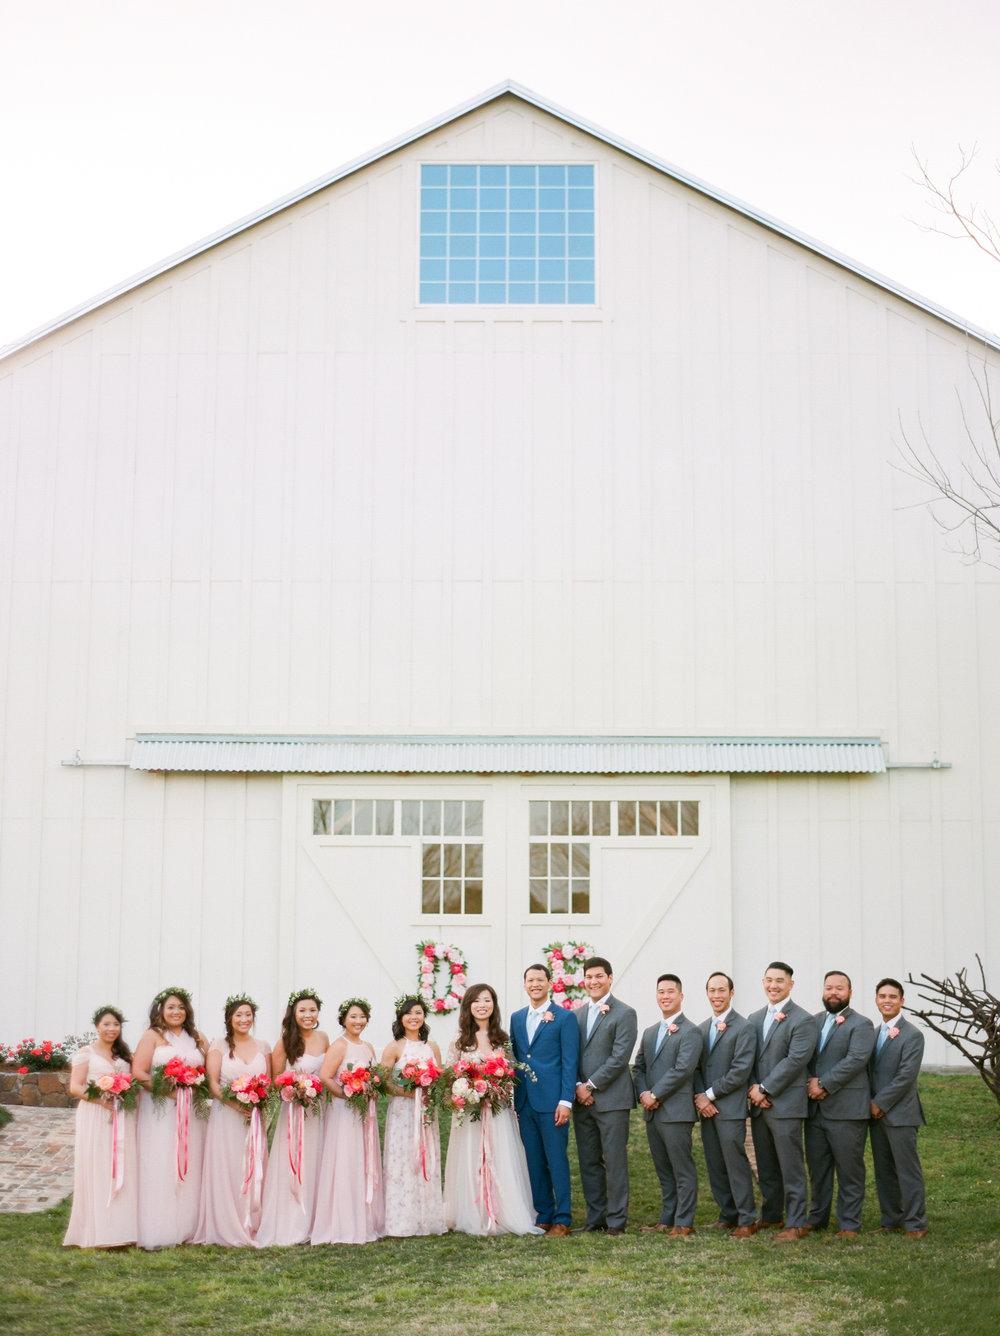 The-Knot-50-Weddings-50-States-Texas-Winner-Dana-Fernandez-photography-houston-wedding-photographer-film-fine-art-destination-22.jpg